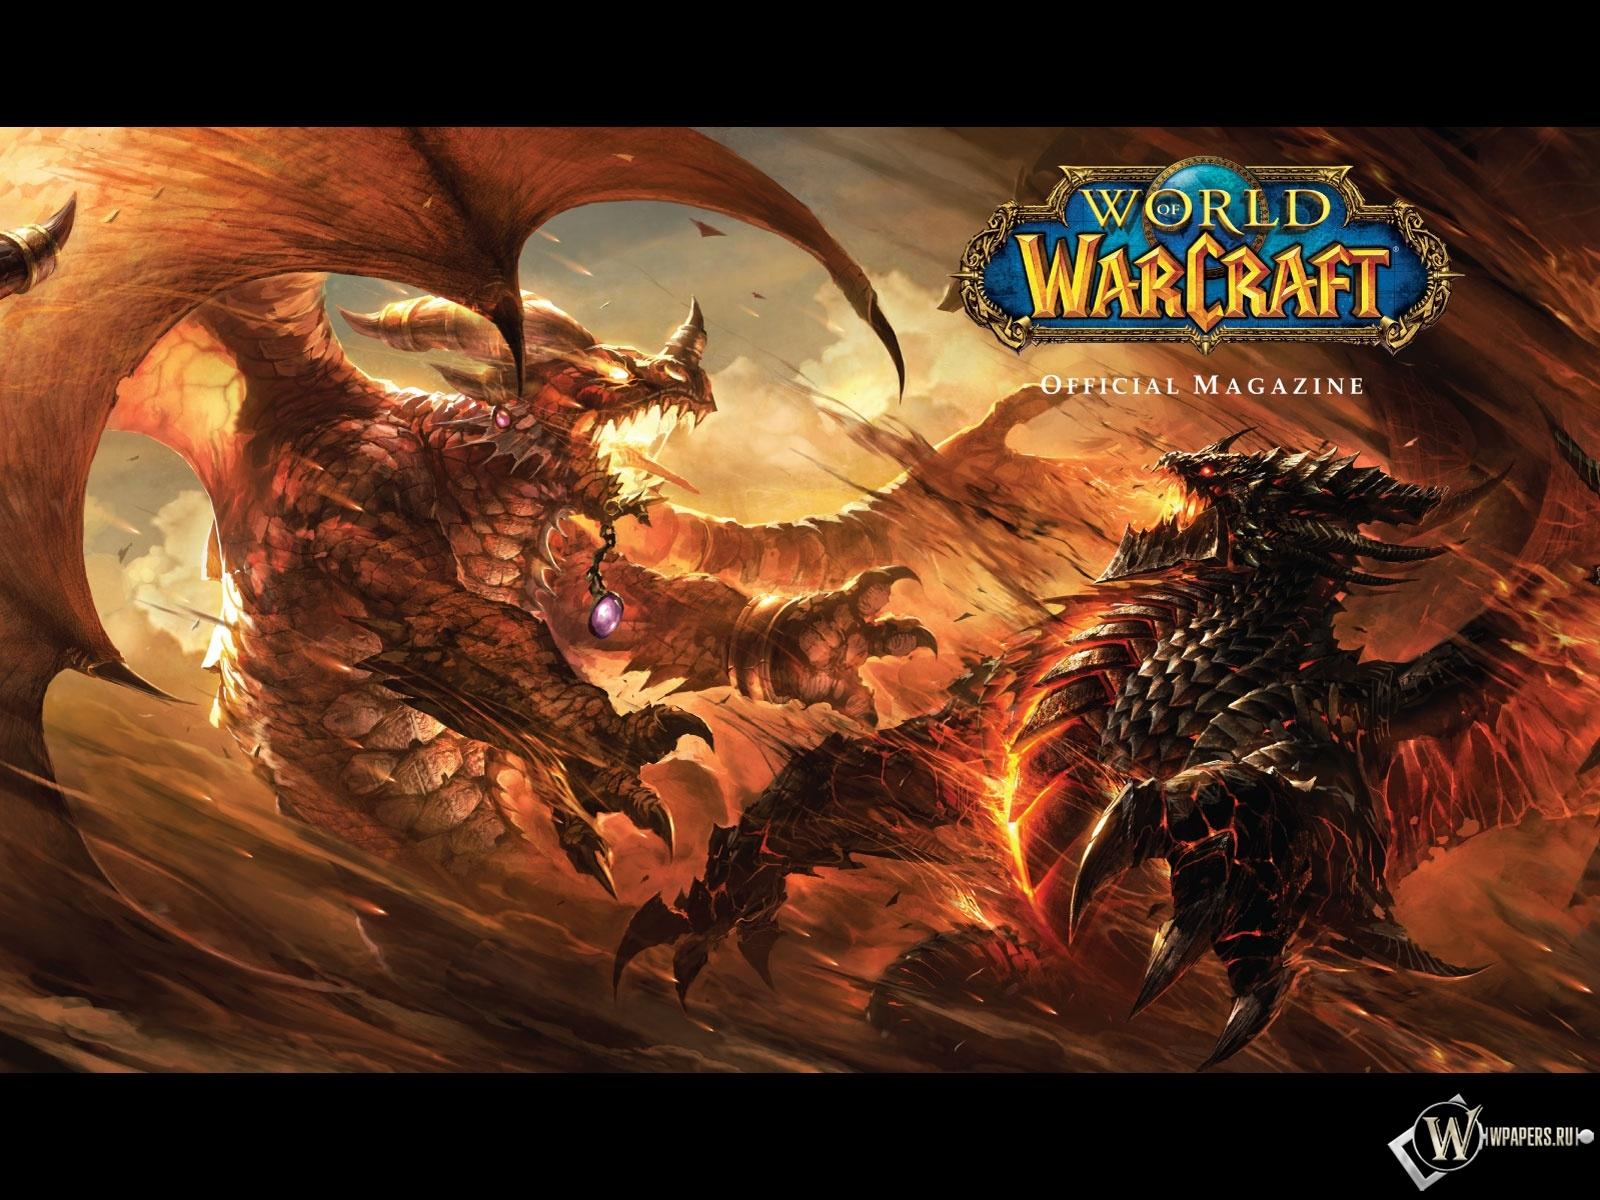 World of Warcraft 1600x1200